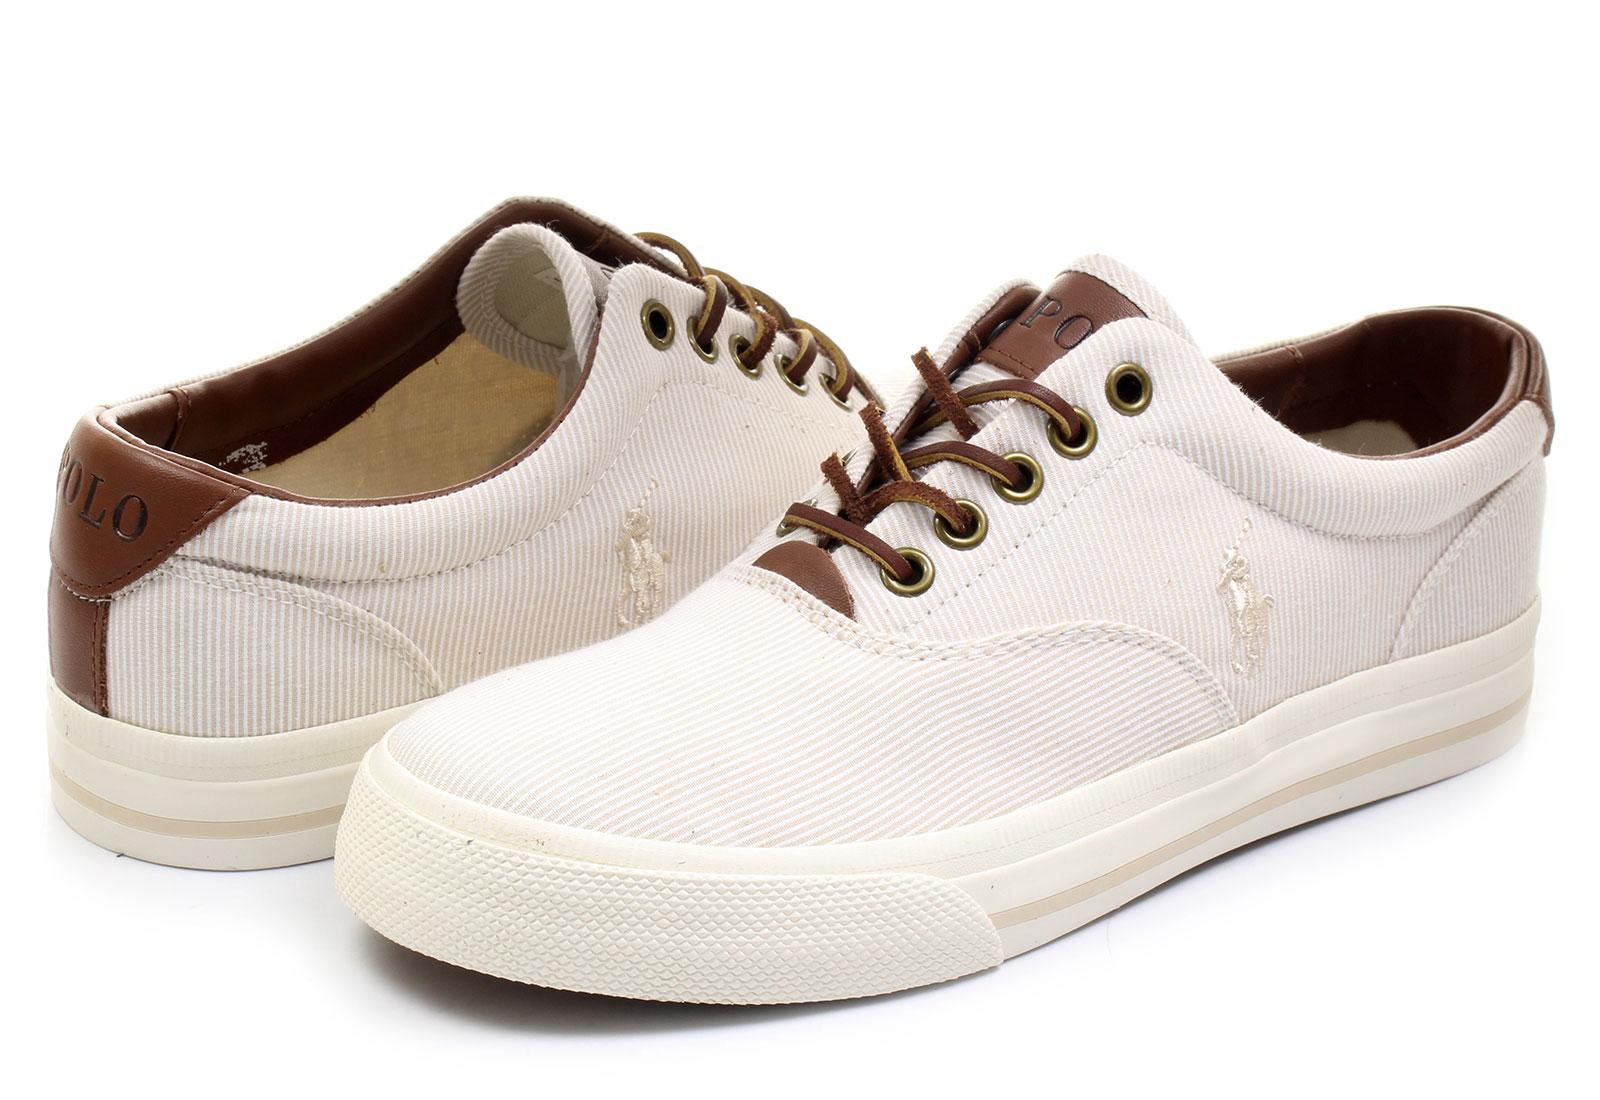 Polo Ralph Lauren Nízké boty - Vaughn-ne - 0222-B-D3G5HTenisky 813d8521e8